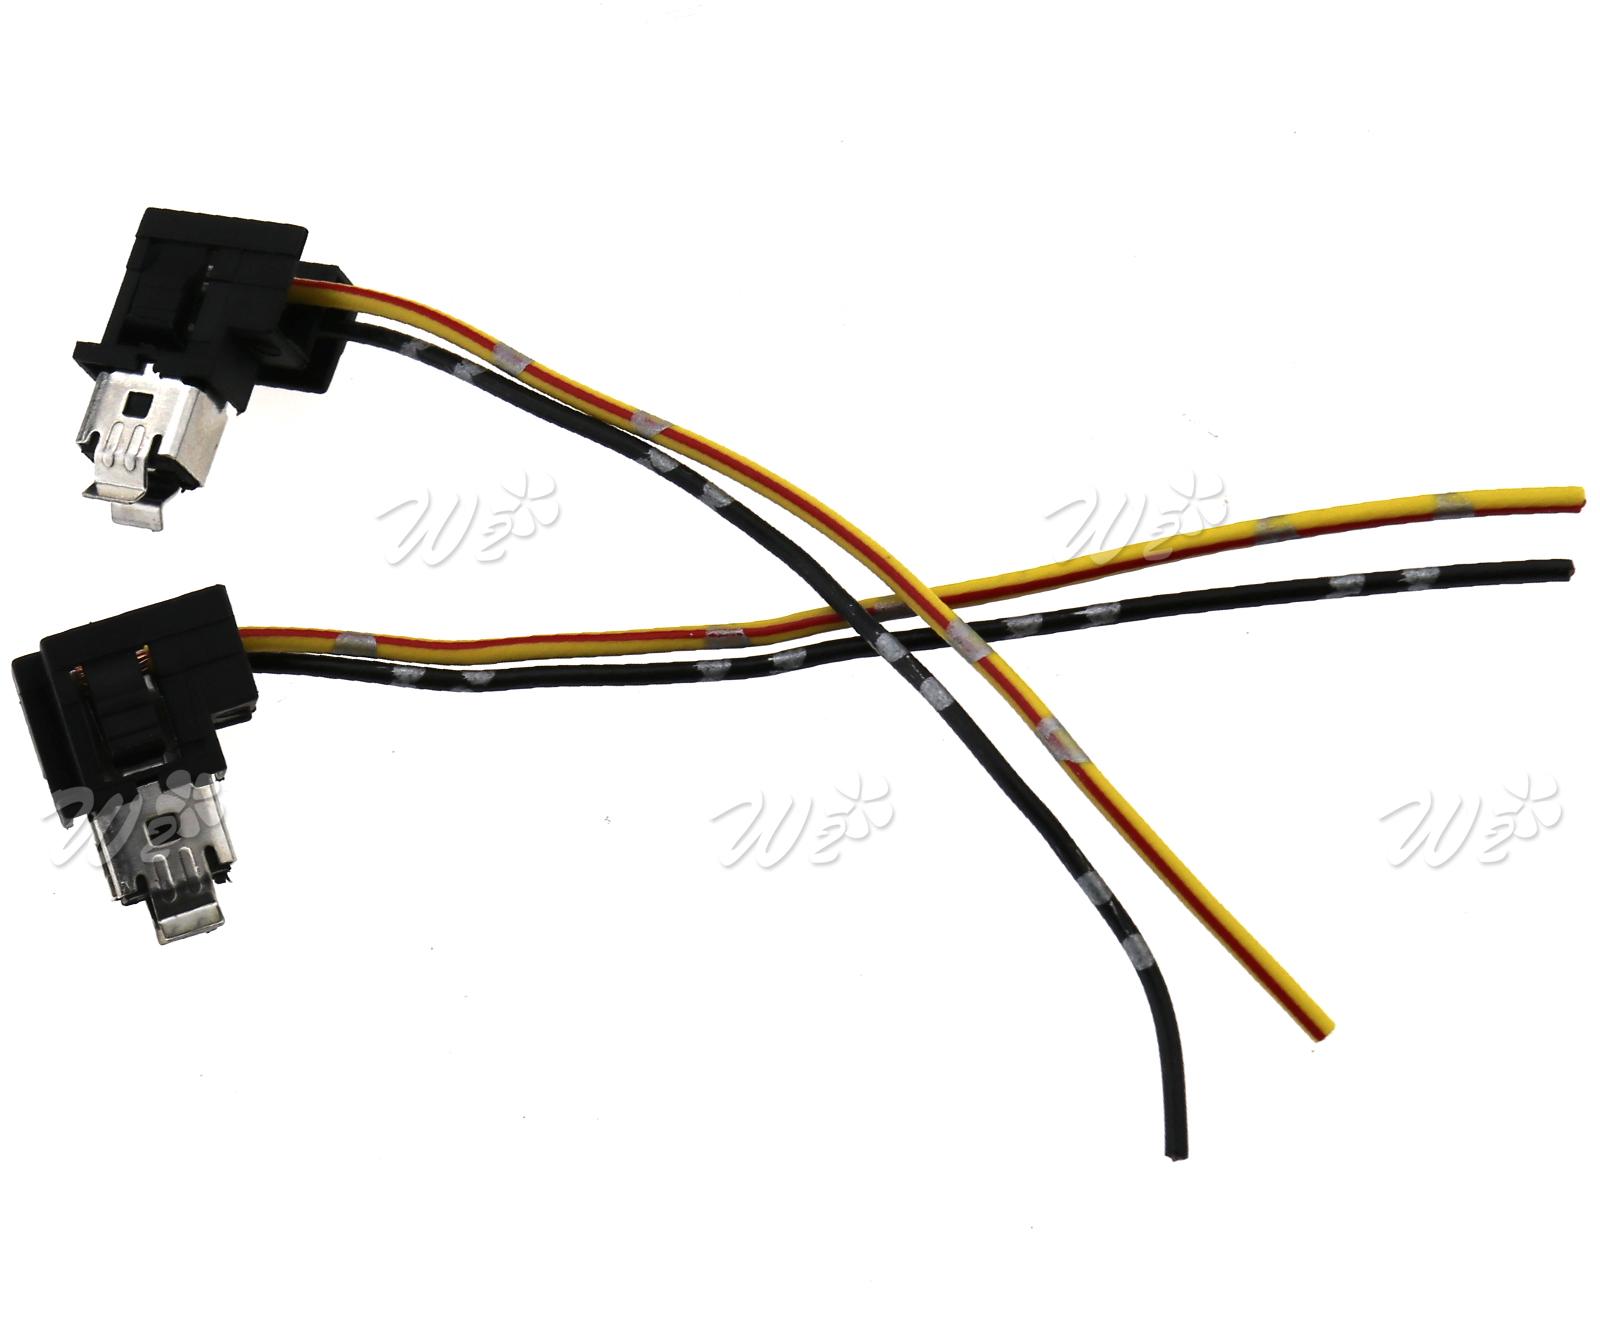 hight resolution of h1 head fog lamp light bulb socket holder wiring connector plug for auto car